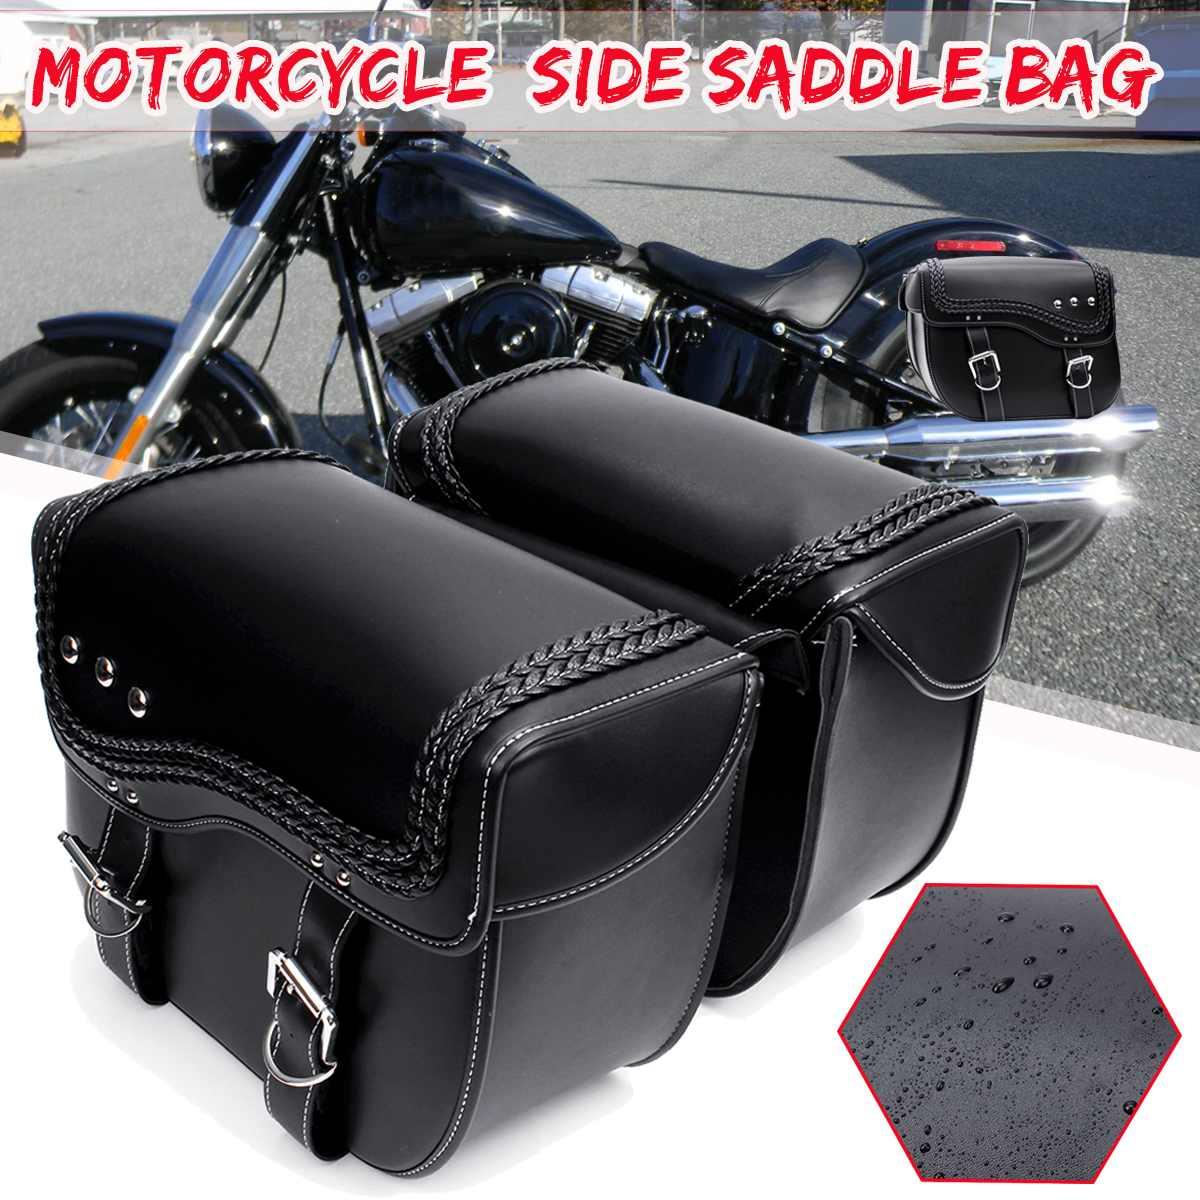 Par Universal Moto Alforje Lateral de Couro PU De Armazenamento Ferramenta Saco Da Bagagem Para Harley/Suzuki/Yamaha/Honda